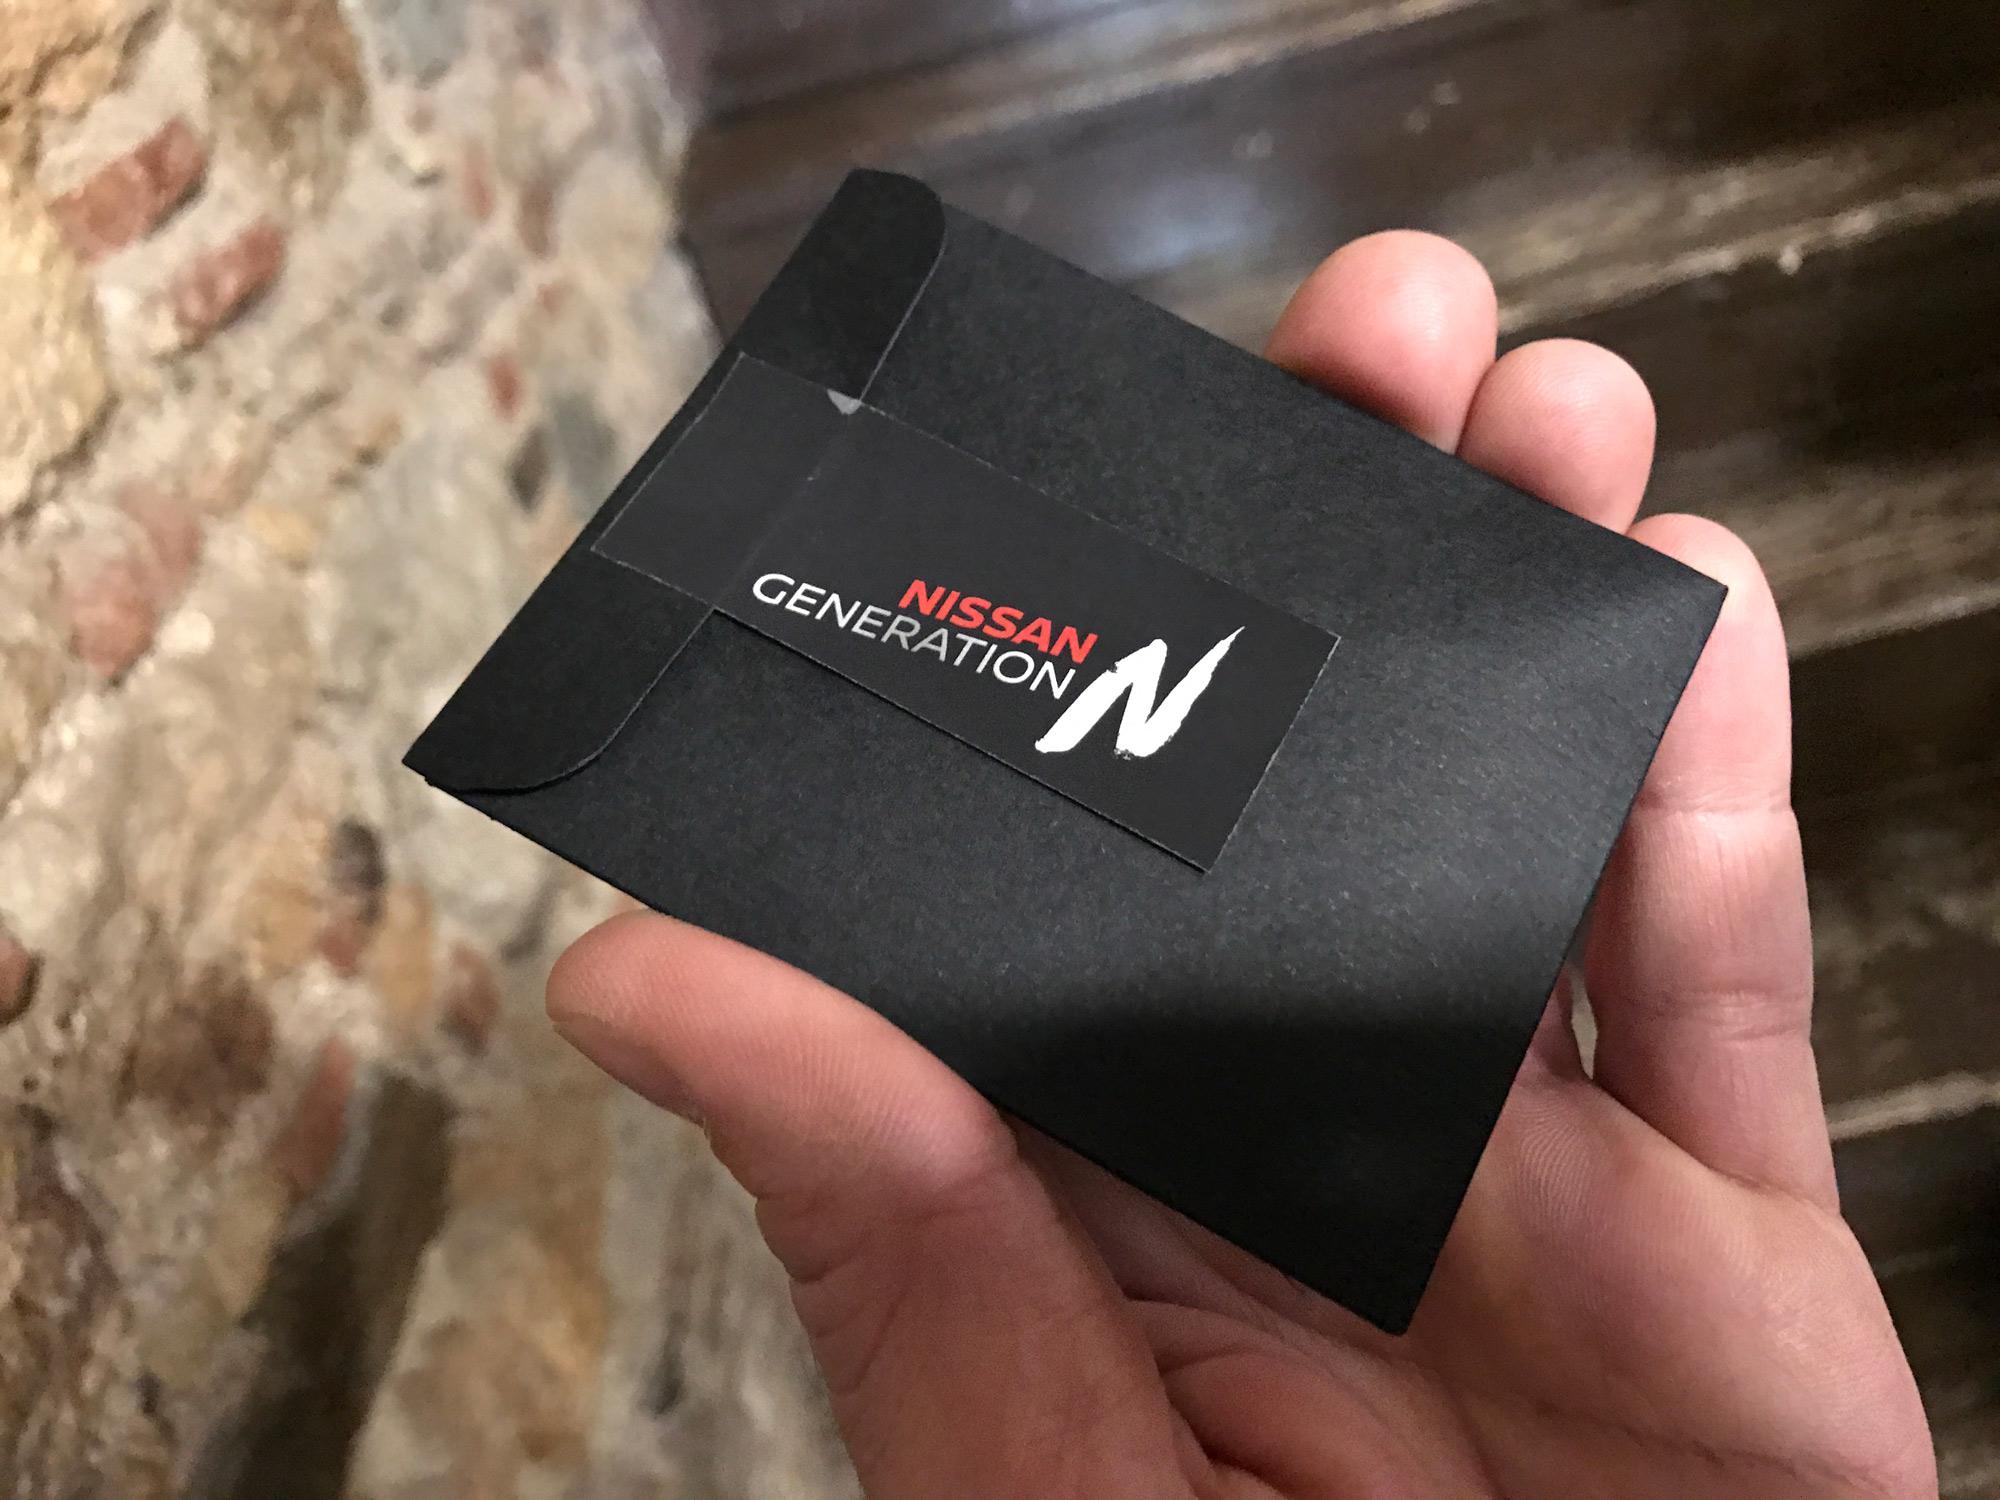 Nissan Genneration N